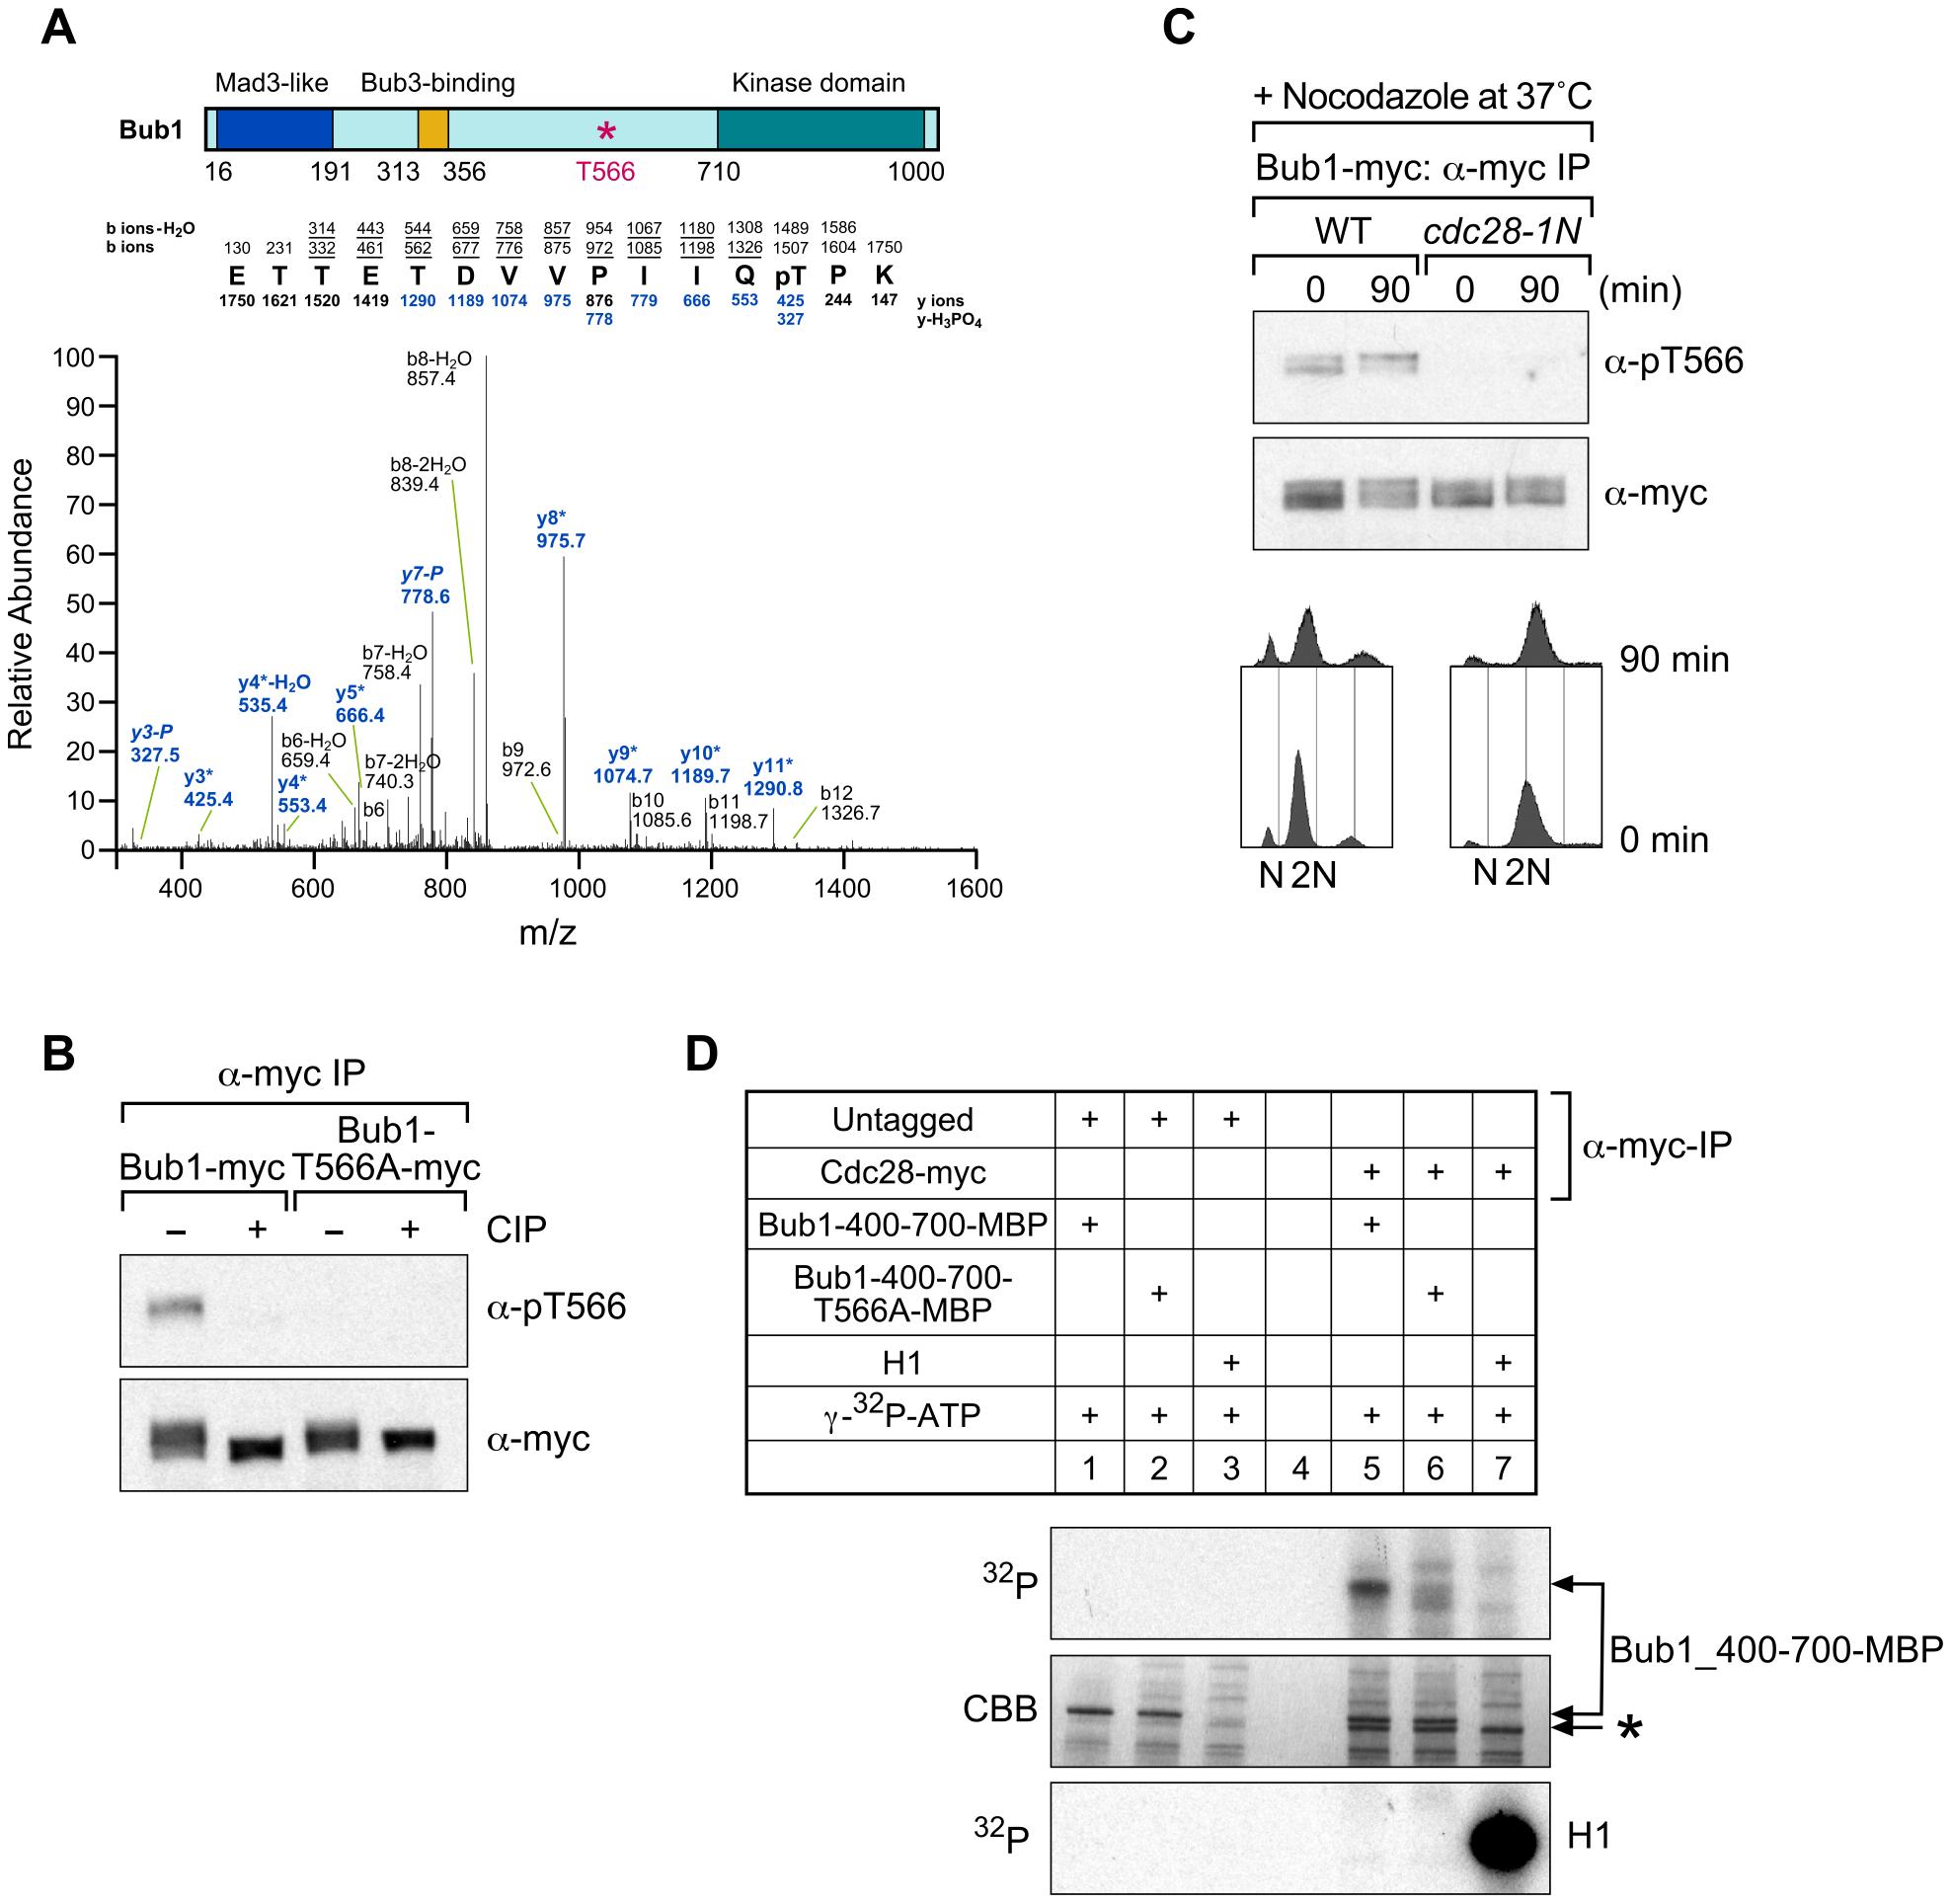 Threonine 566 on Bub1 is phosphorylated dependently on Cdc28 <i>in vivo</i>.